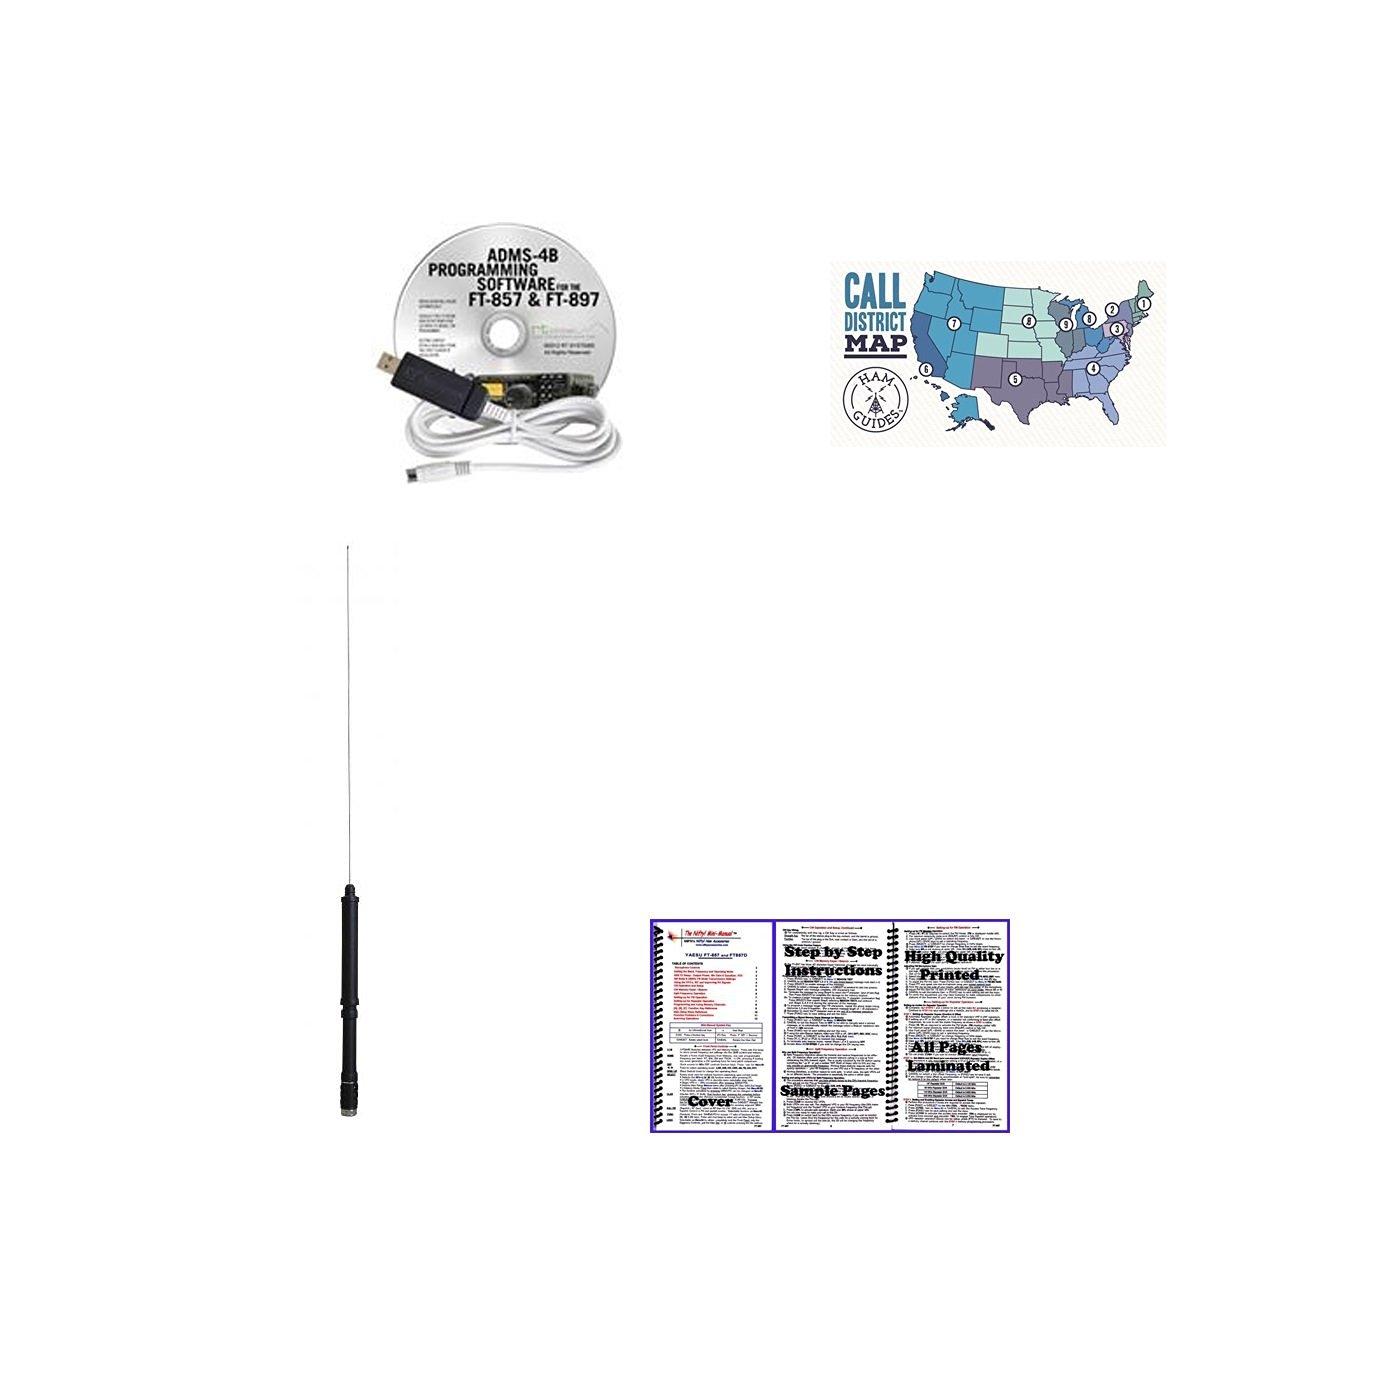 Yaesu FNB-83 Battery and Ham Guides Pocket Reference Card Bundle! Comet SMA-24 HT Antenna Yaesu Speaker Microphone - Programming Software//Cable Yaesu Car Charger Nifty Guide Yaesu FT-270R Accessory Pack Bundle Yaesu Desktop Charger